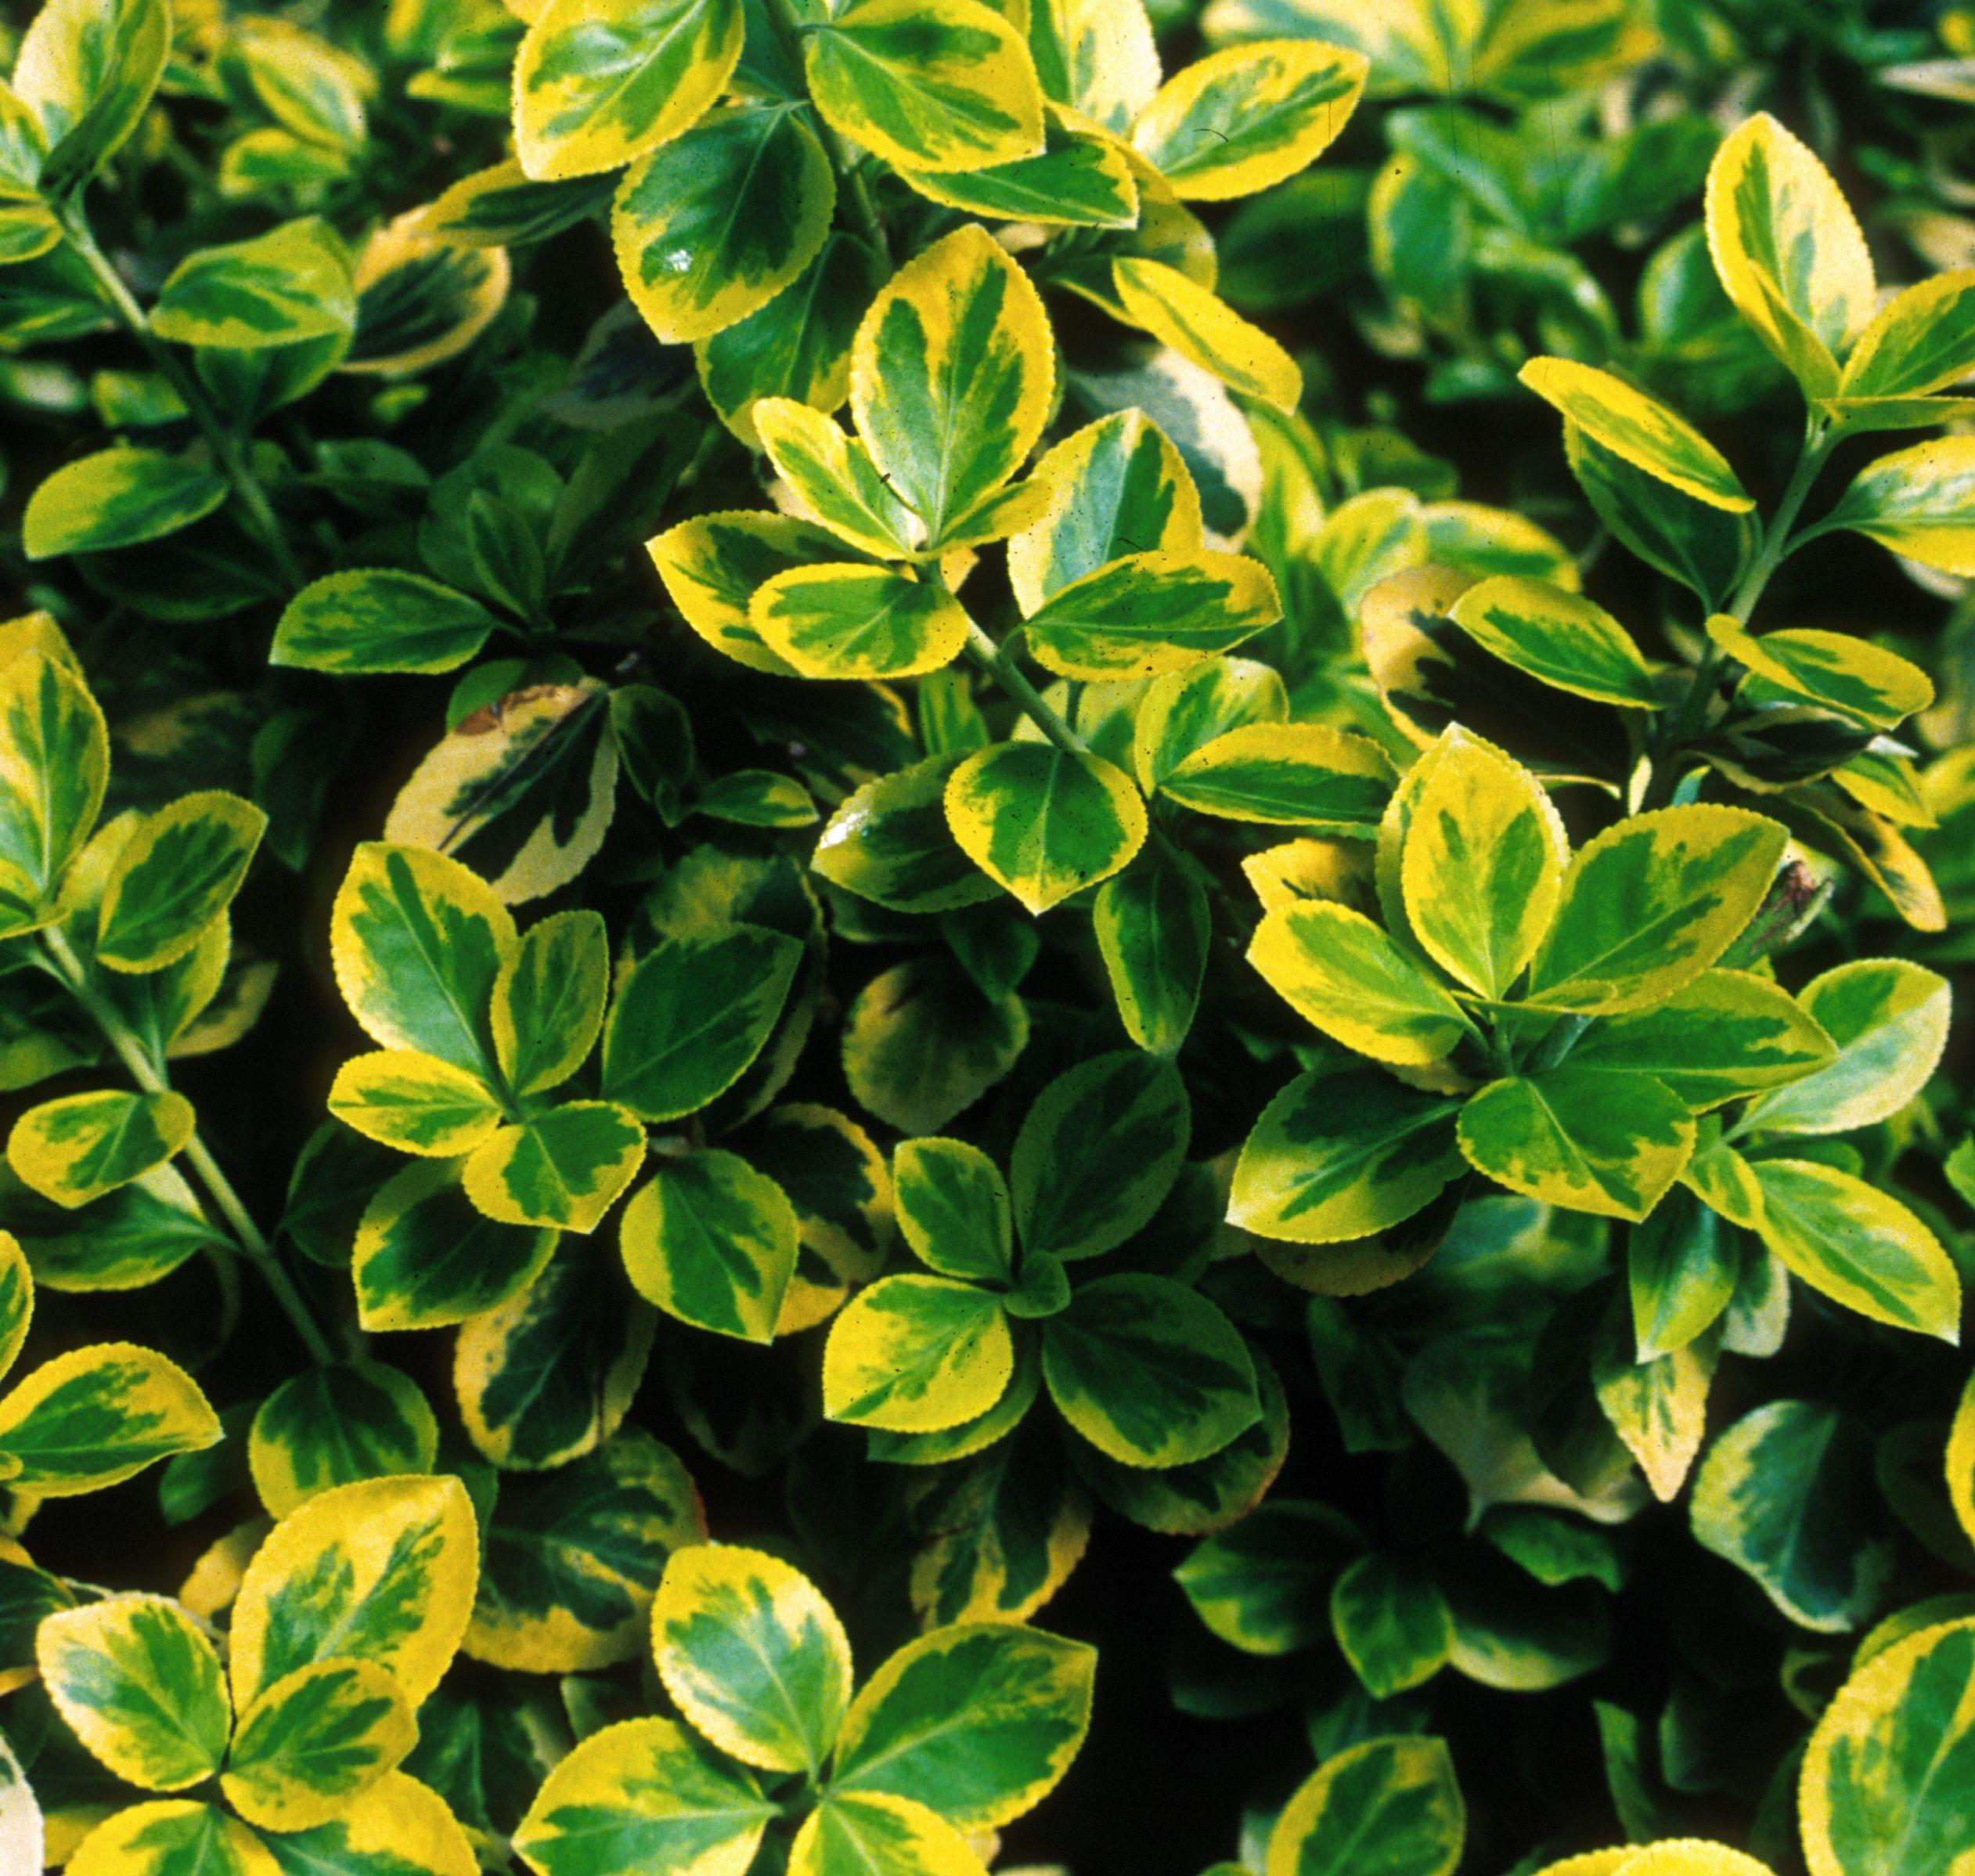 Moonshadow Euonymus Evergreen Shrubs Shrubs Bushes And Shrubs